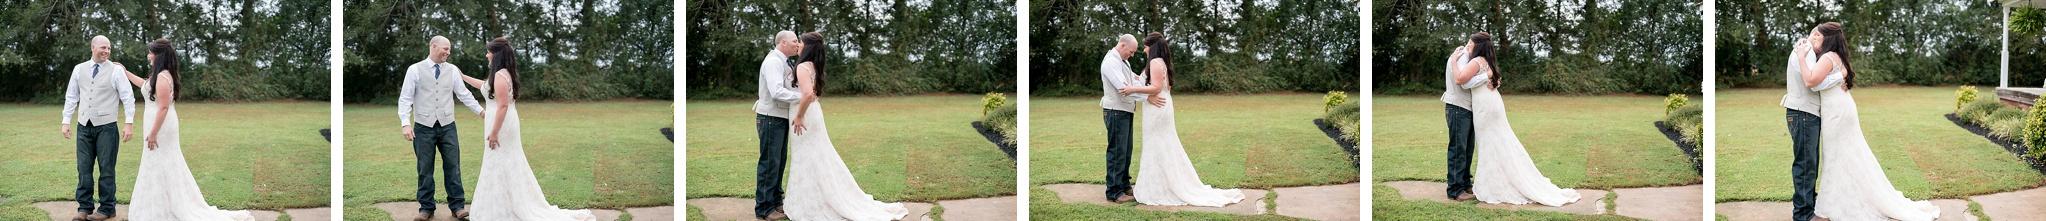 Tarboro-NC-Wedding-Photographer-018.jpg